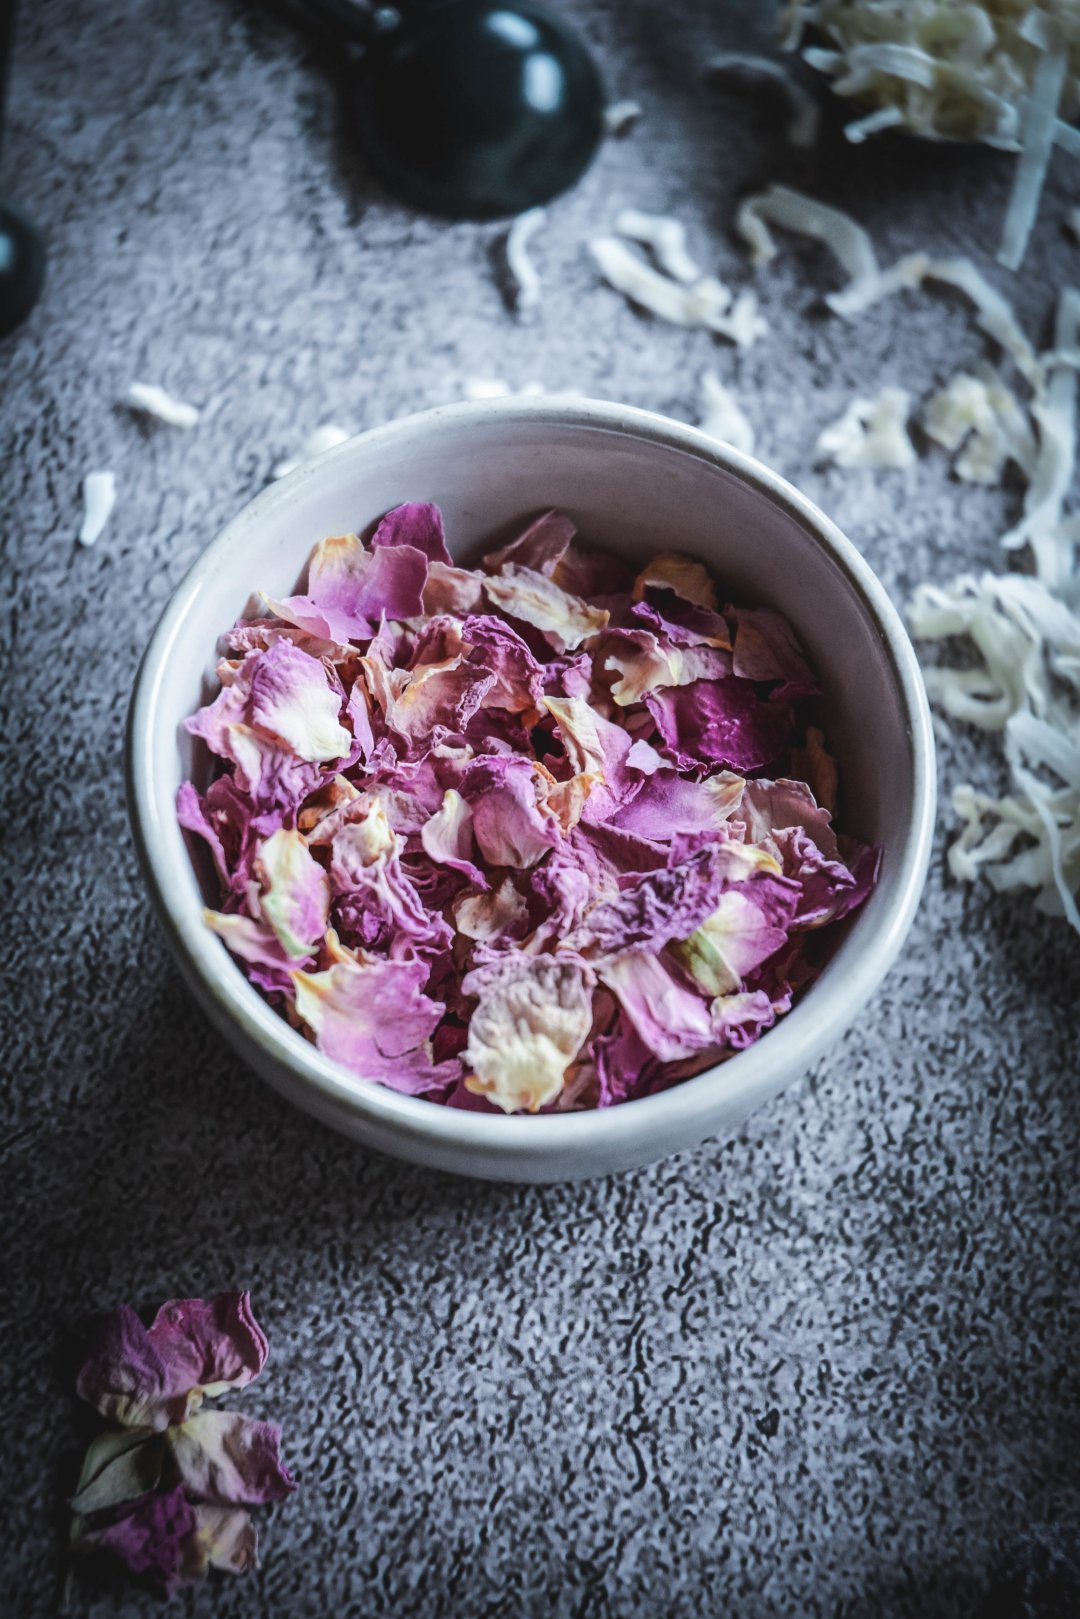 Dried rose petals in bowl